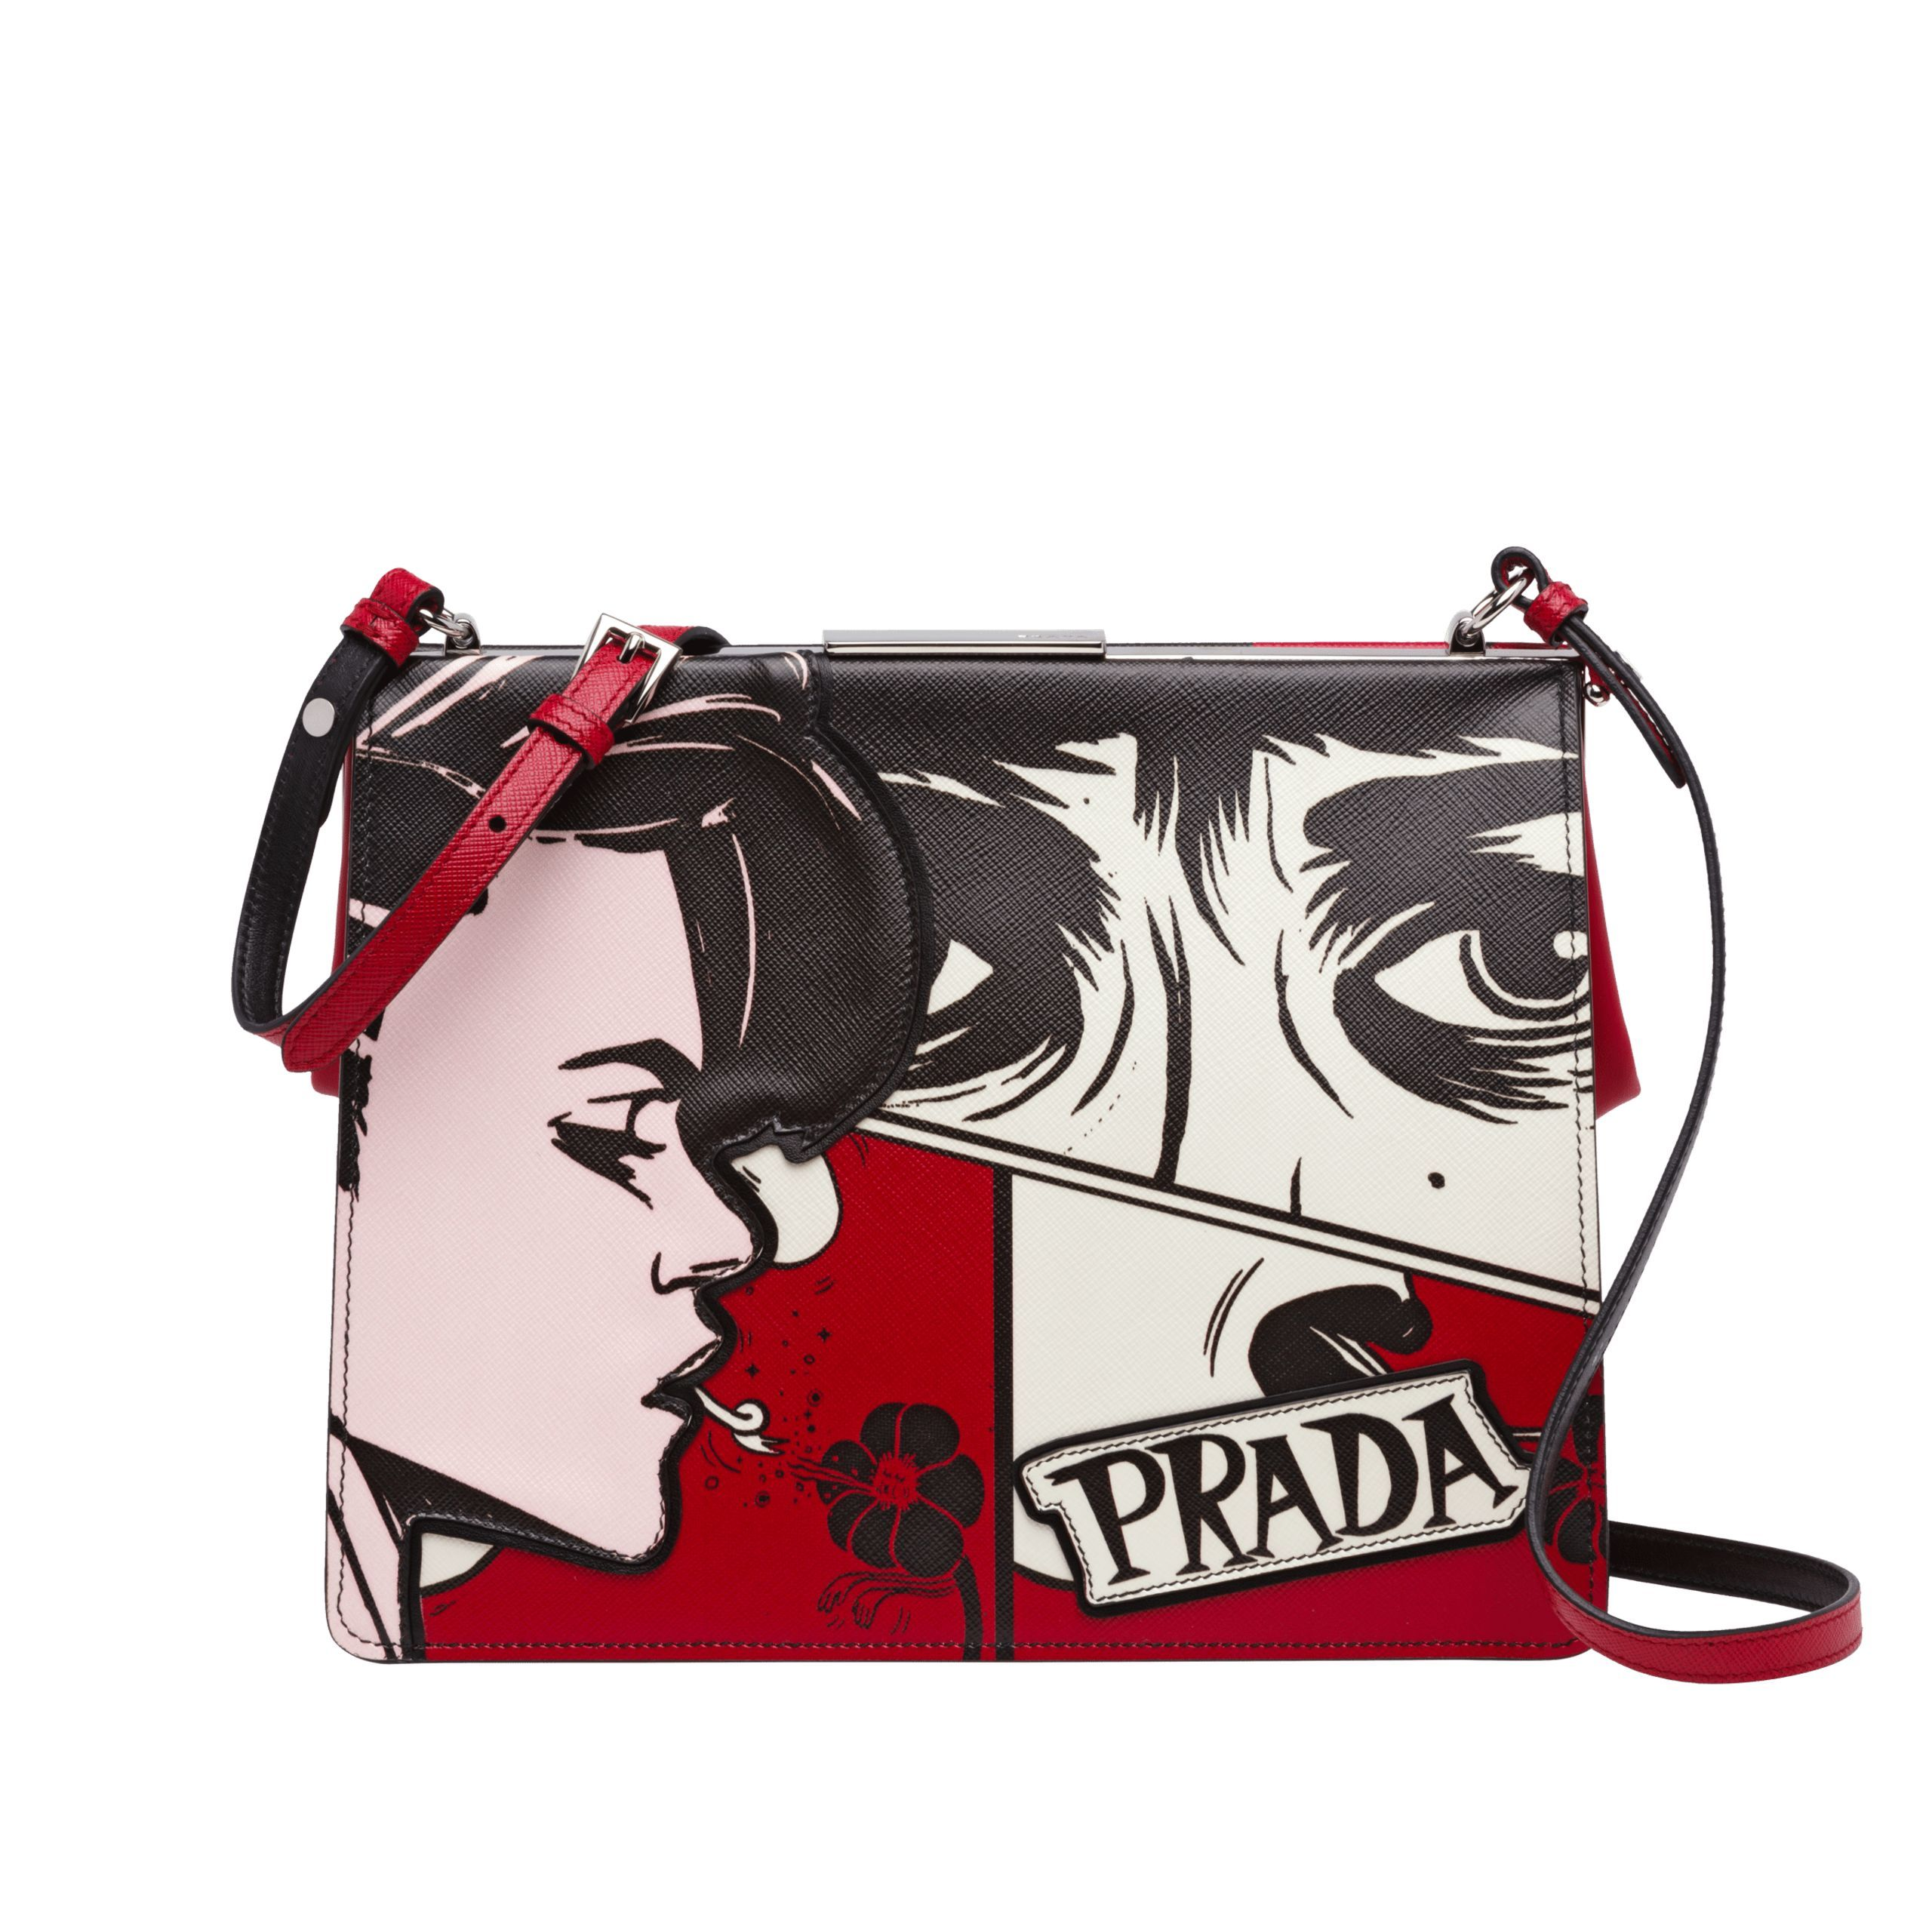 f9bf63b09fed3f Prada | Light Frame Printed Leather Bag | $2,400 | Characterized by the  distinctive metal spring hinge frame, the Saffiano leather Prada Light  Frame bag is ...